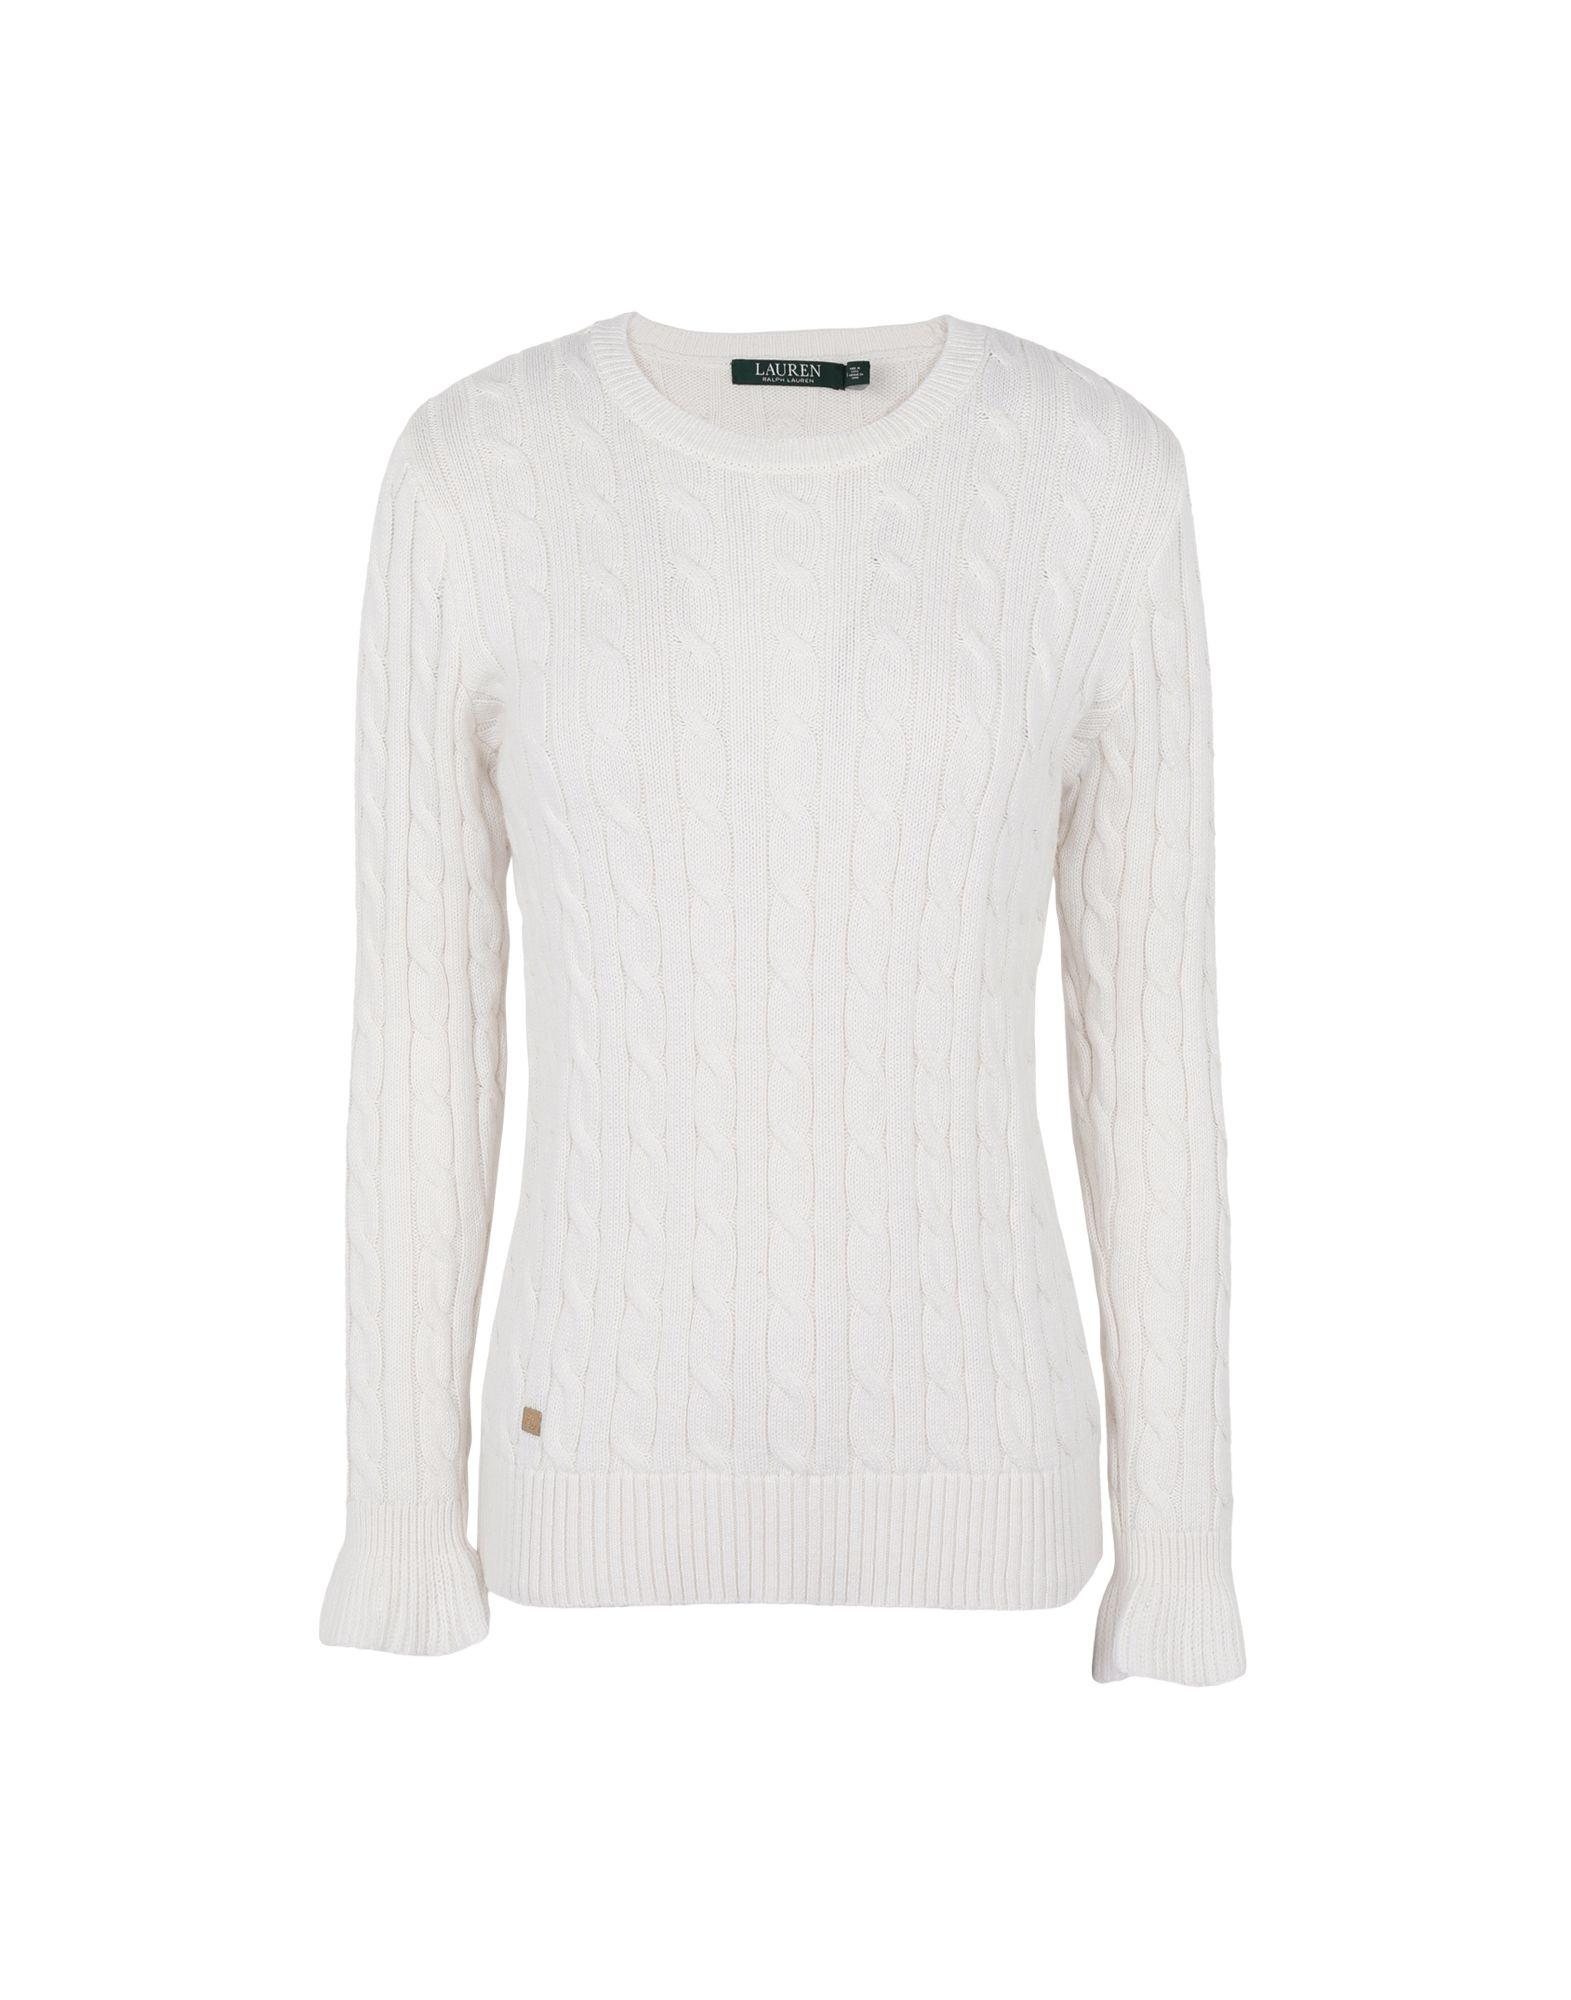 Ruffled-cuff cotton sweater pullover lauren...